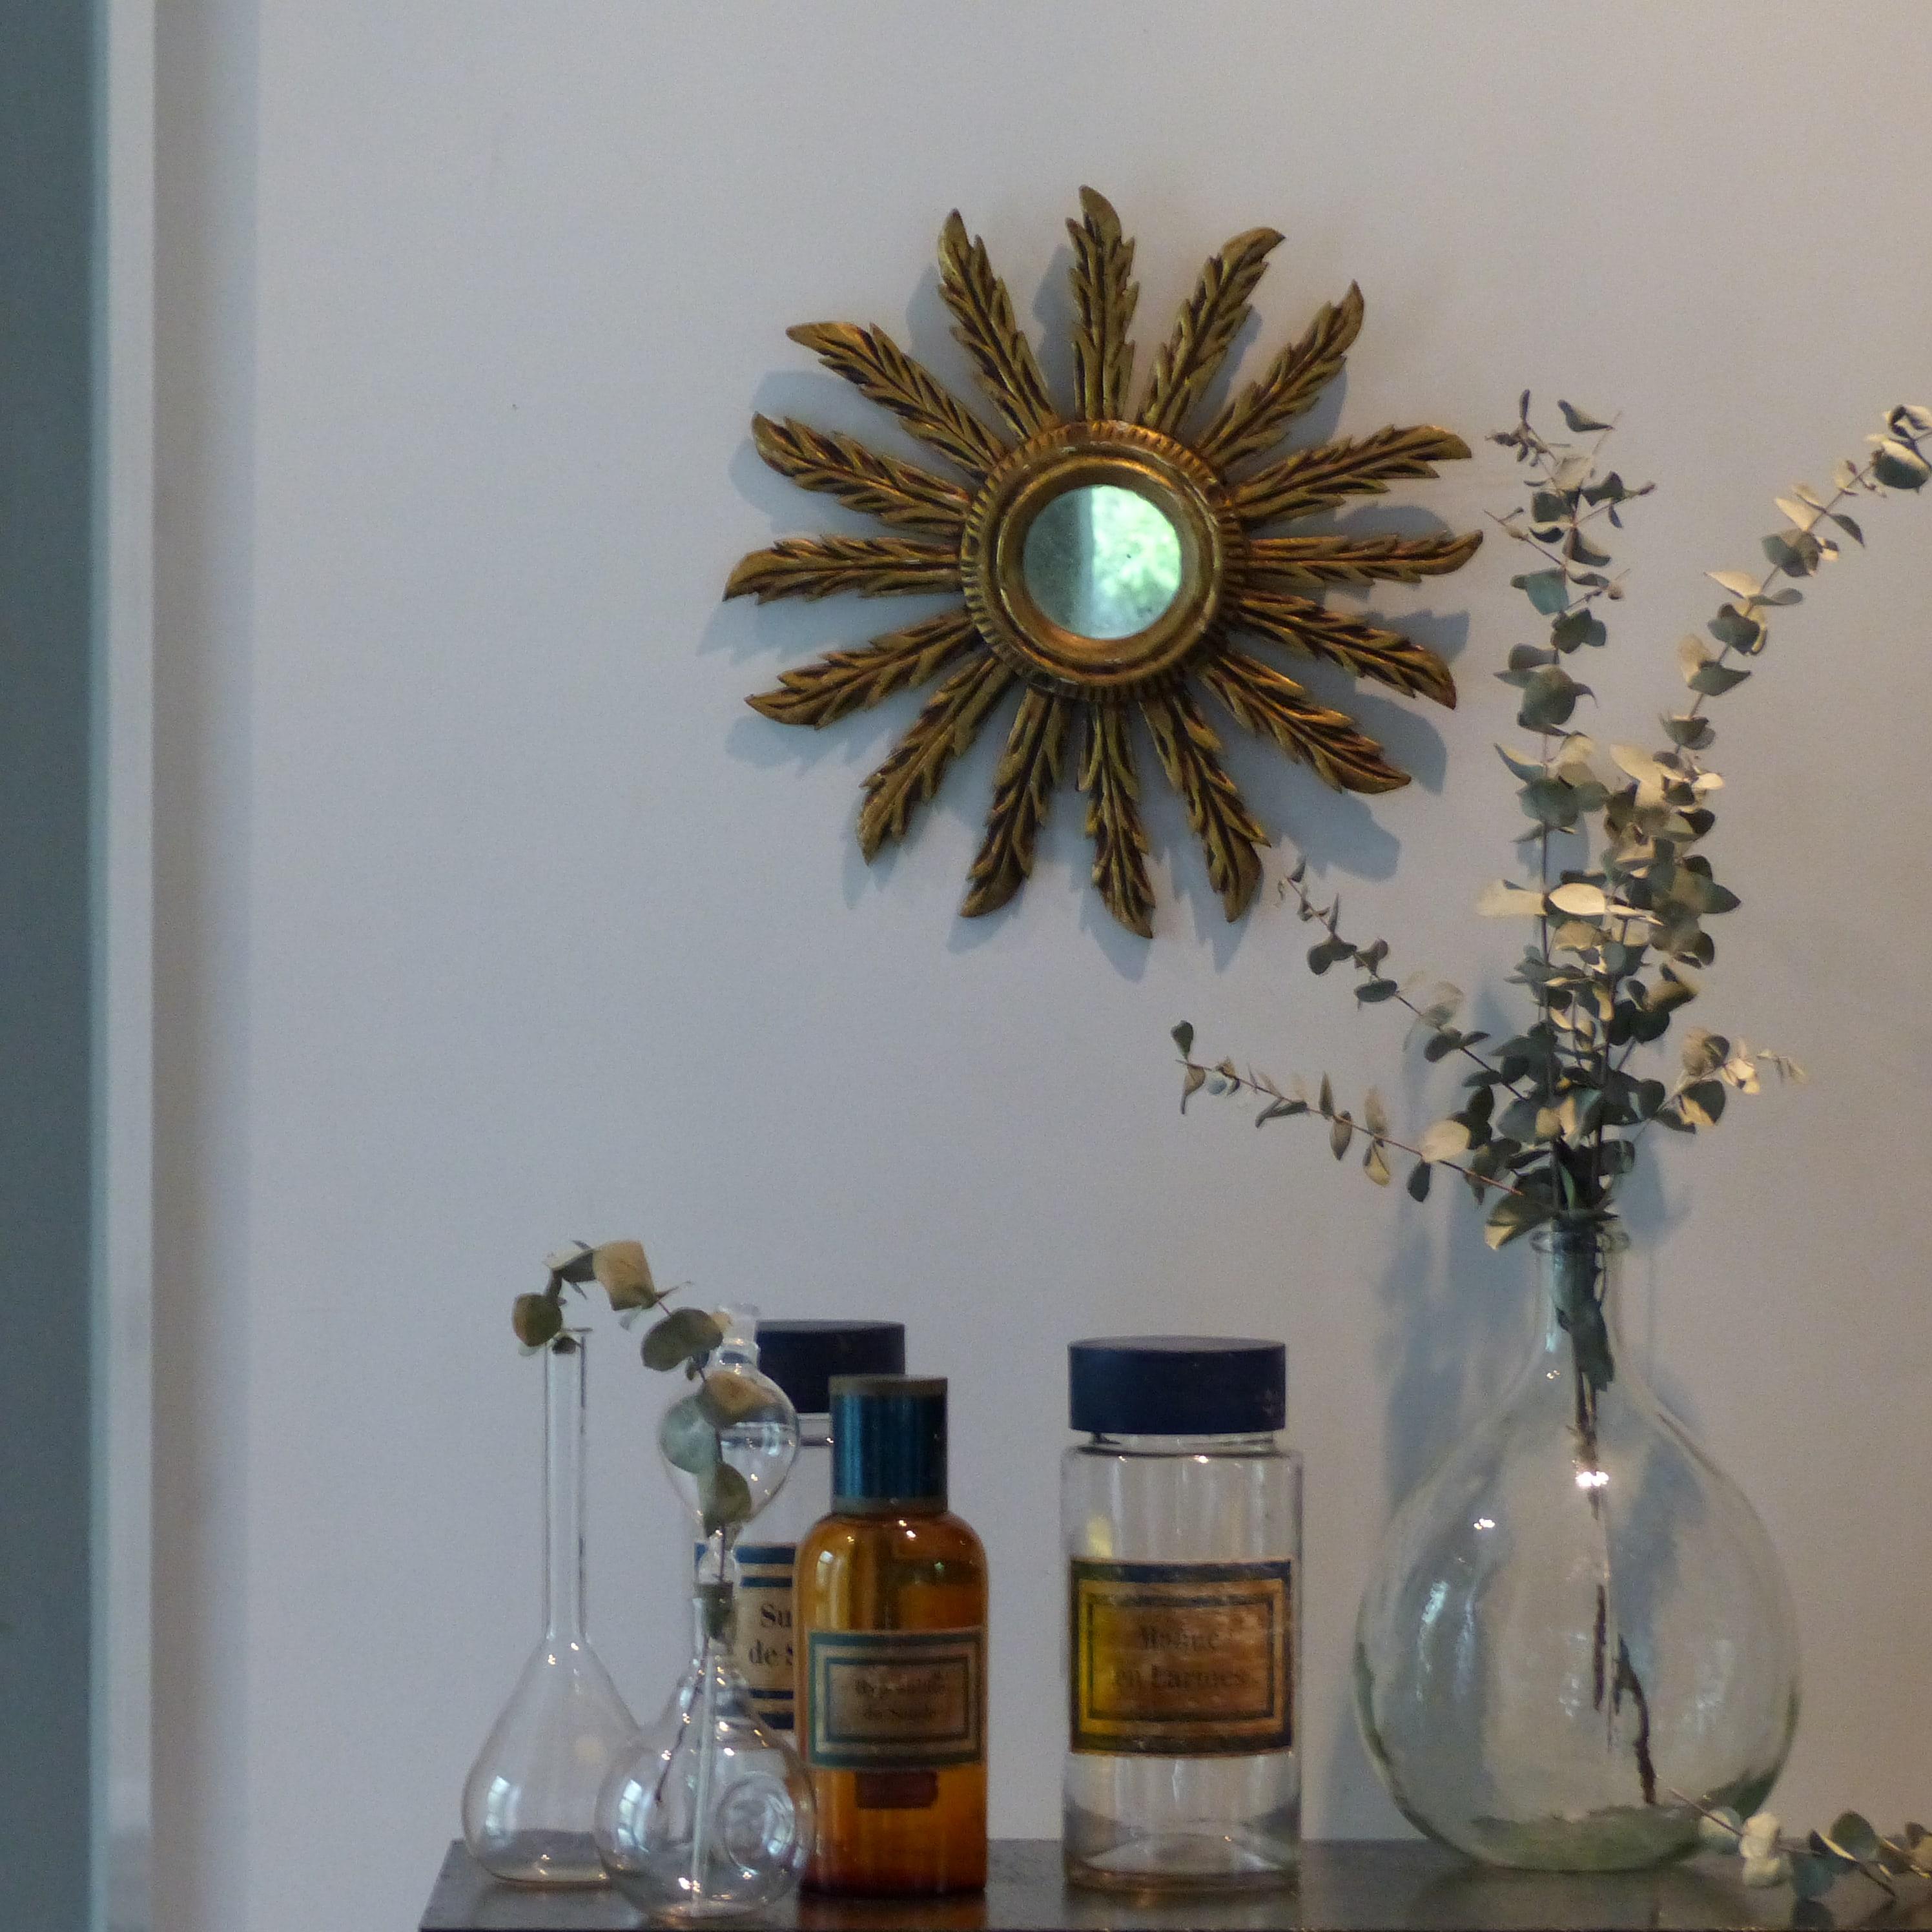 Miroir soleil en bois dor lignedebrocante brocante en for Petit miroir soleil